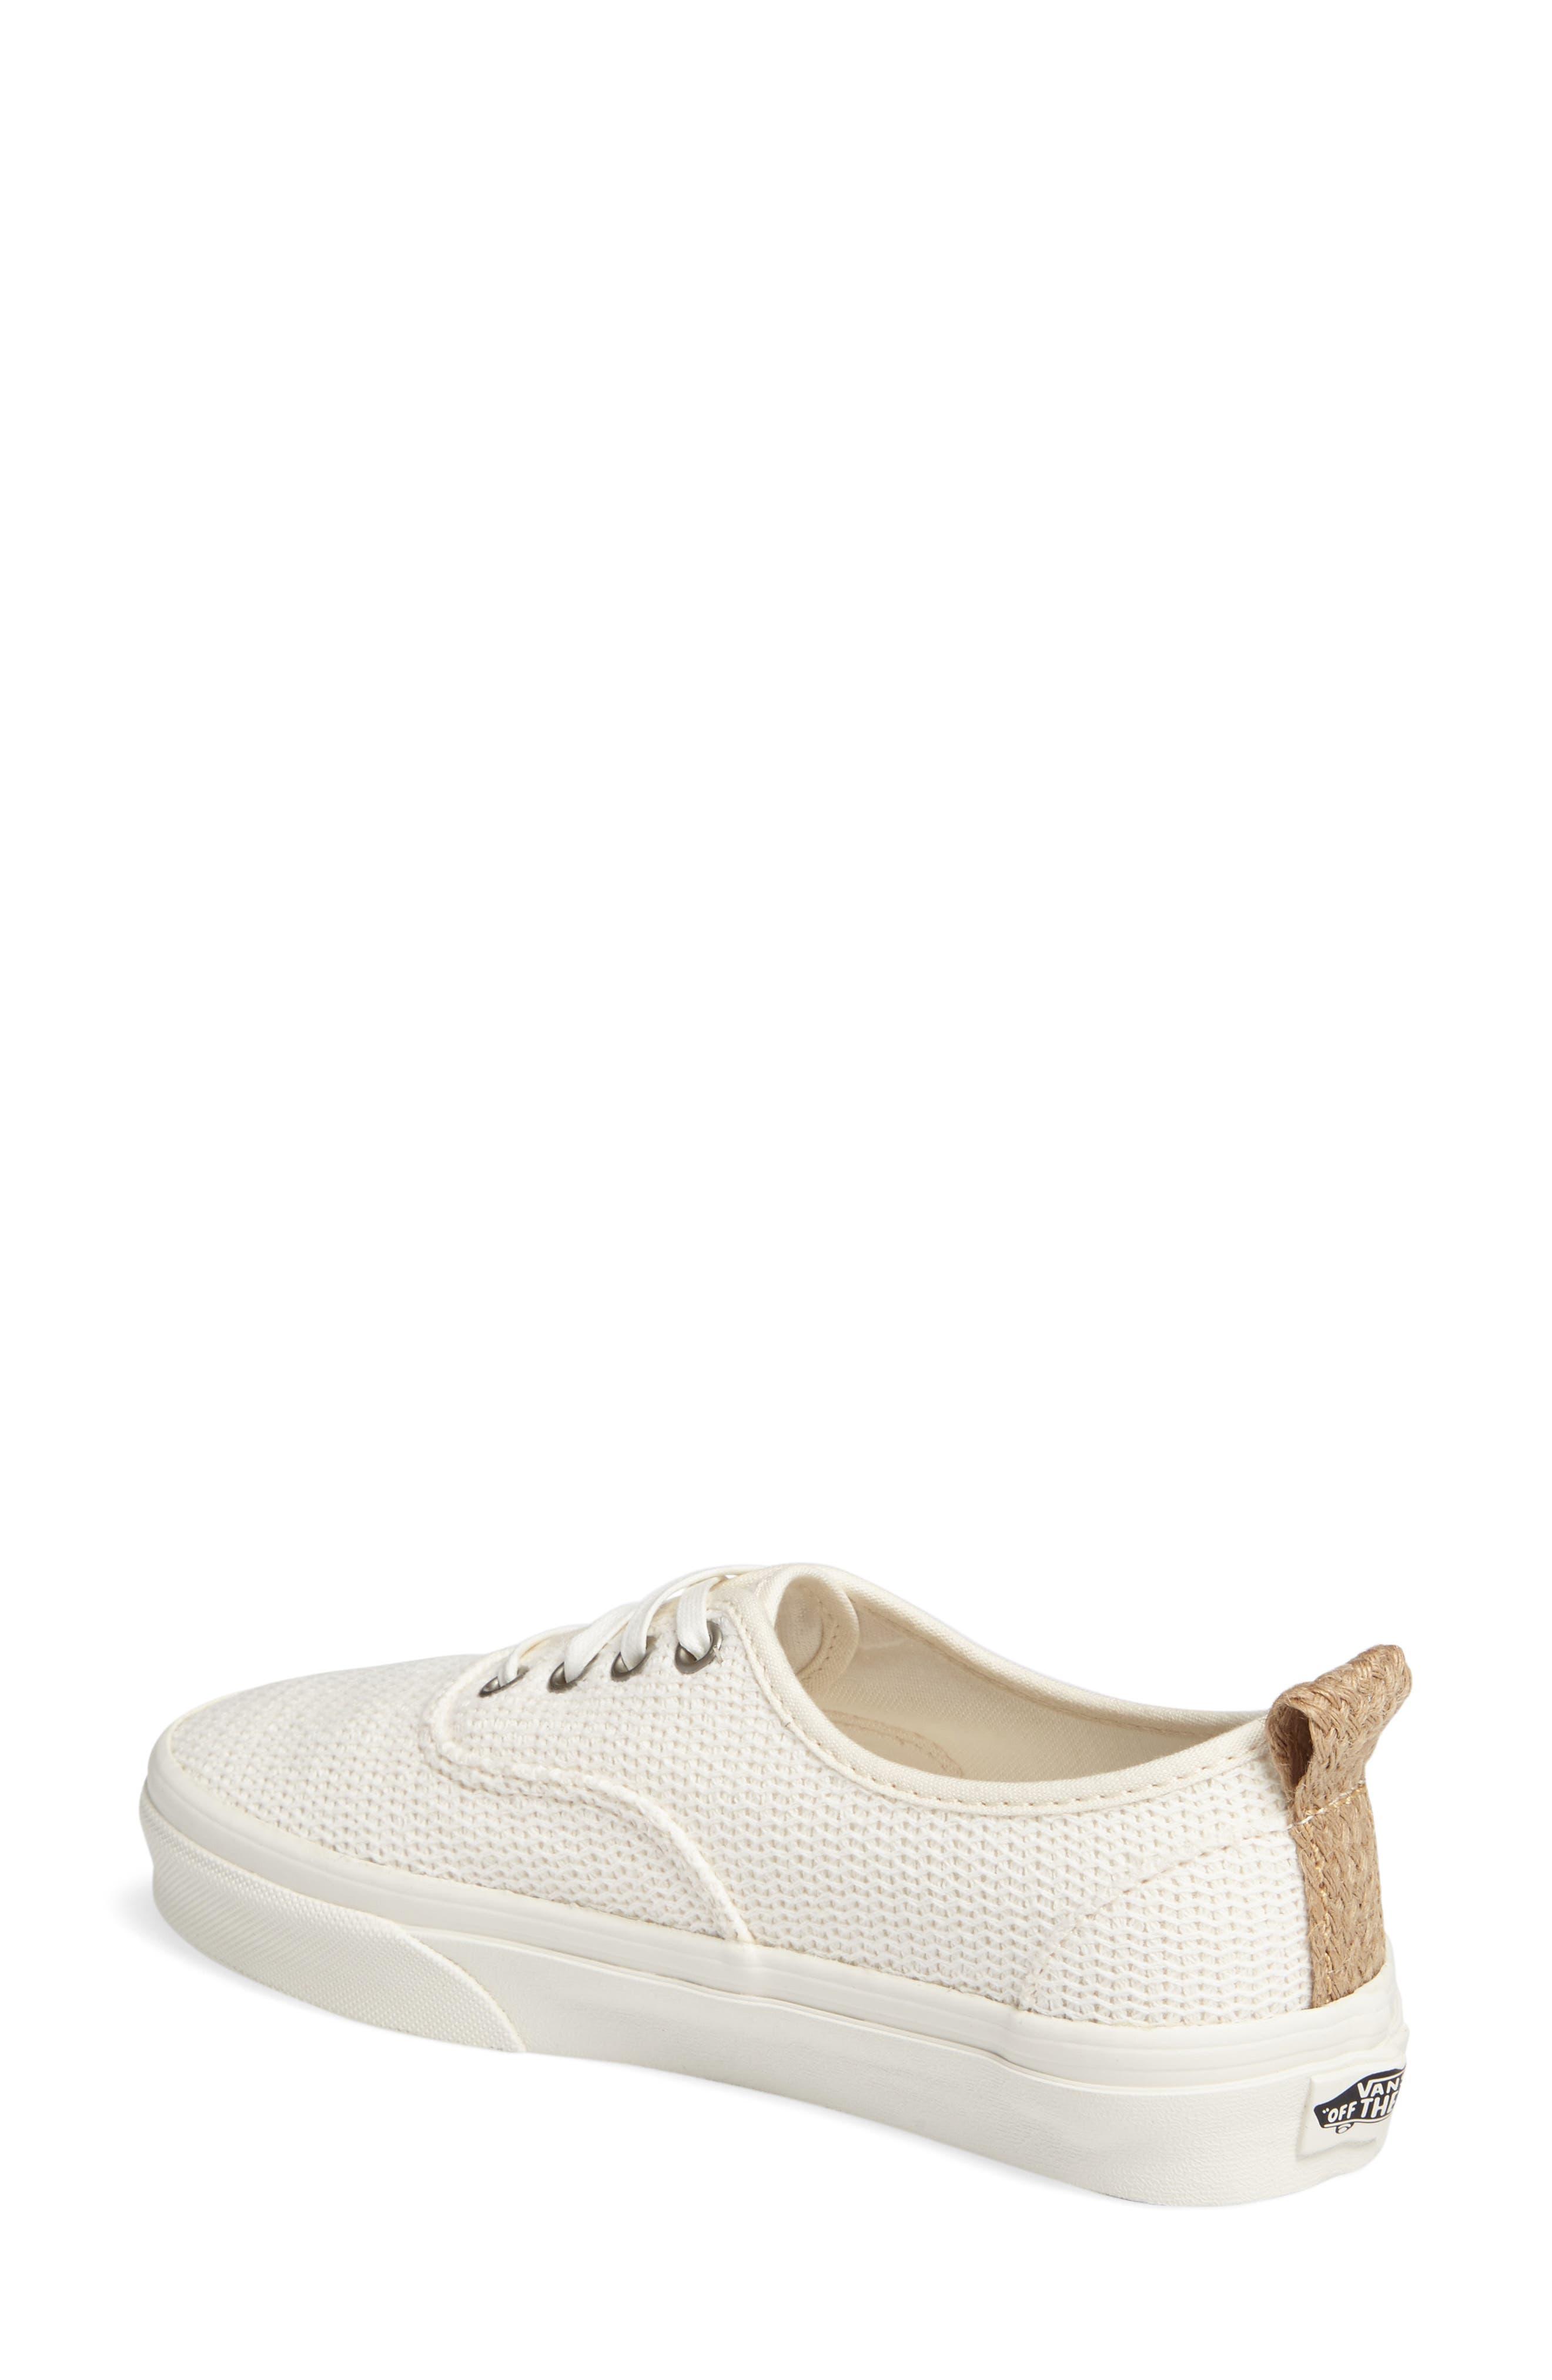 Alternate Image 2  - Vans Um Authentic PT Sneaker (Women)